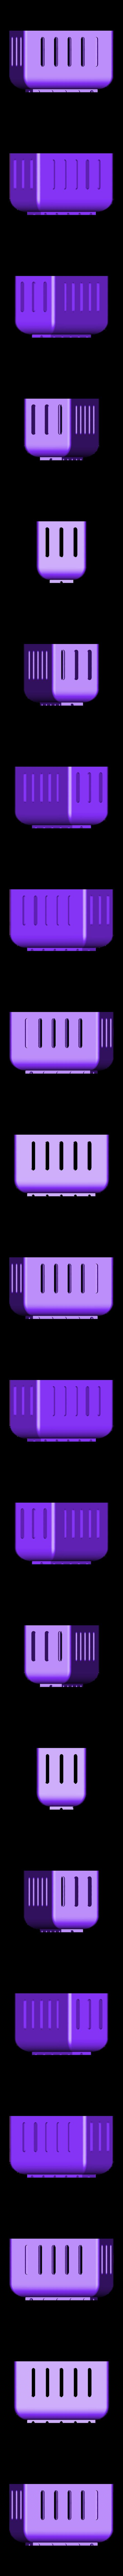 Toothbrush Body.stl Download STL file Tooth Brush Holder/ spoon holder/fork holder • 3D printer template, Eve